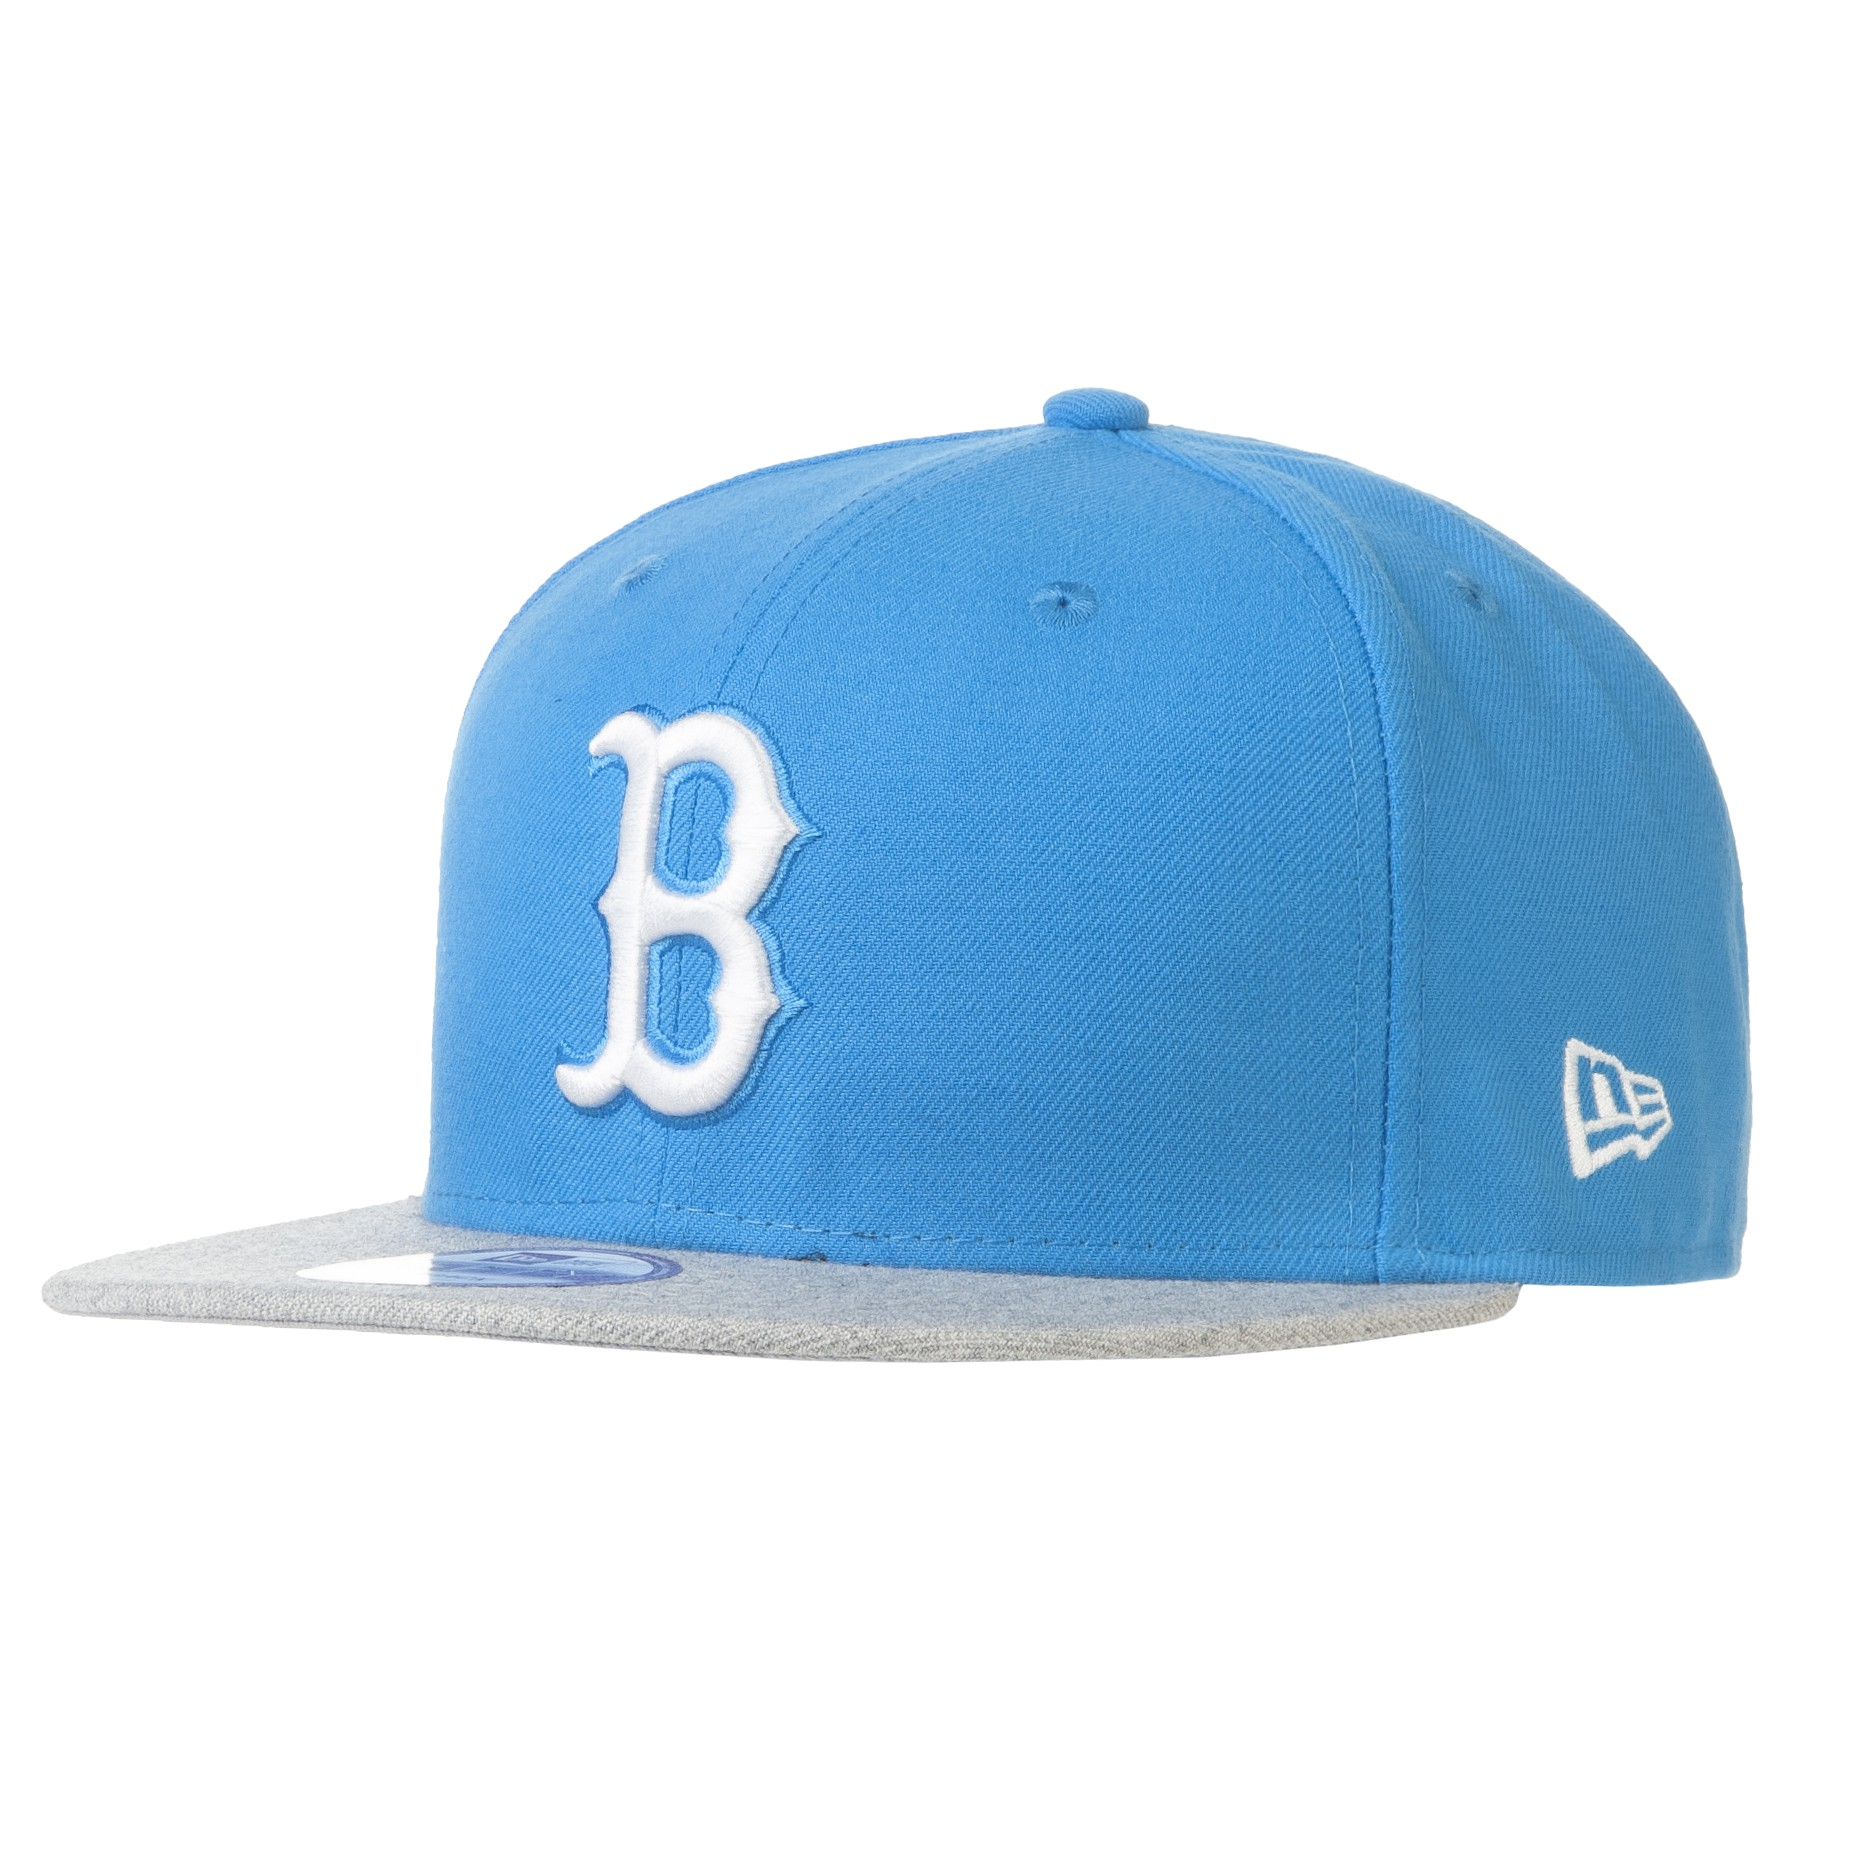 Kšiltovka New Era Boston Red Sox 9Fifty Popheather blue/grey